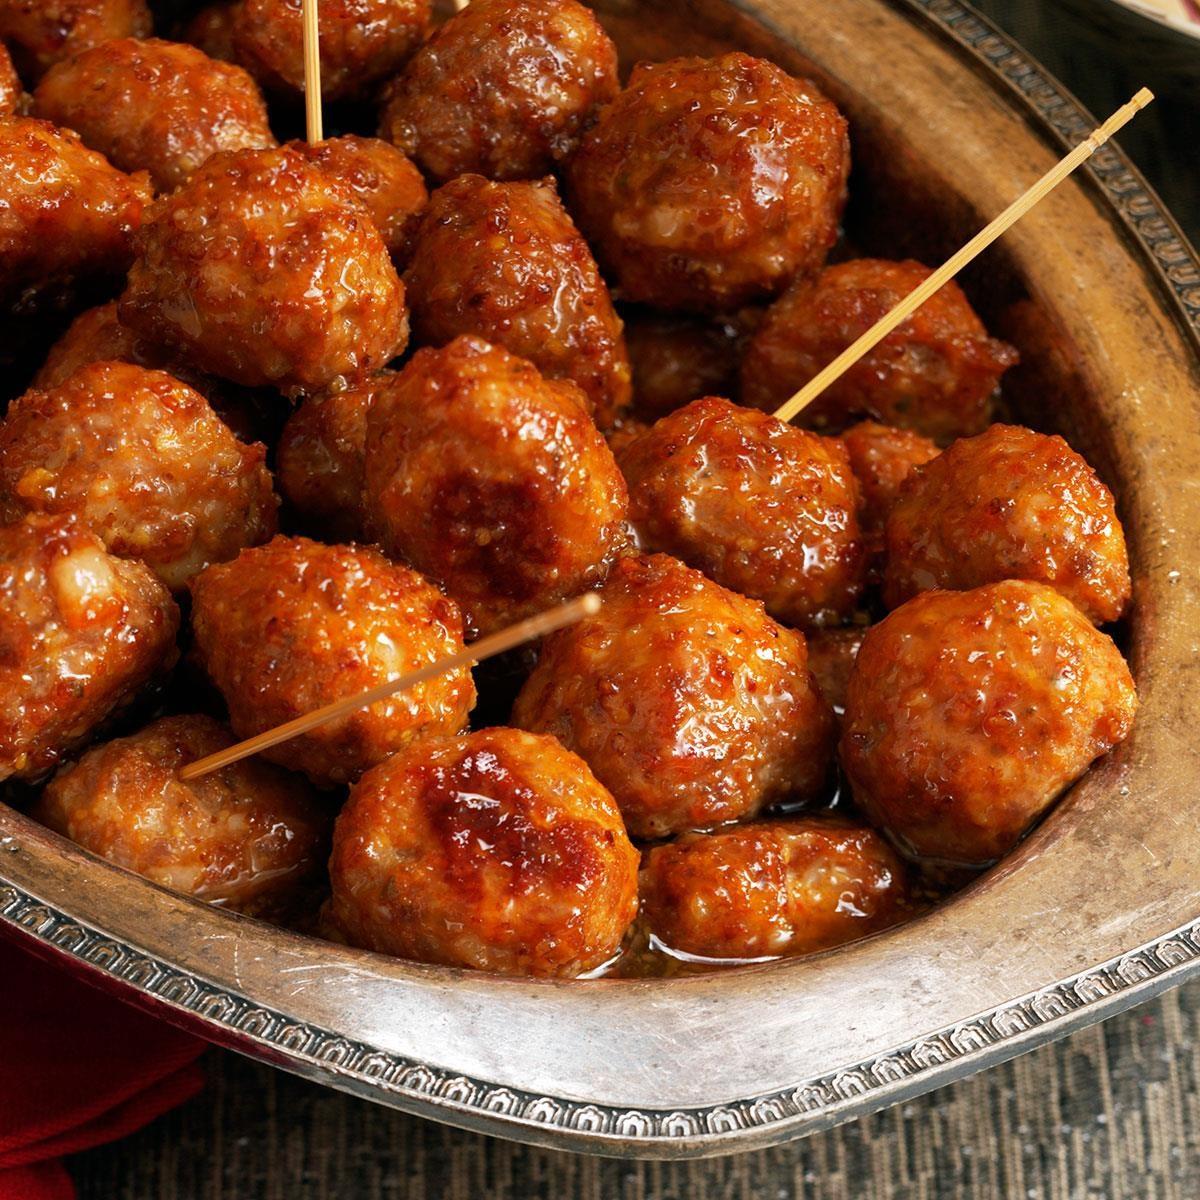 Brown Sugar-Glazed Meatballs Recipe